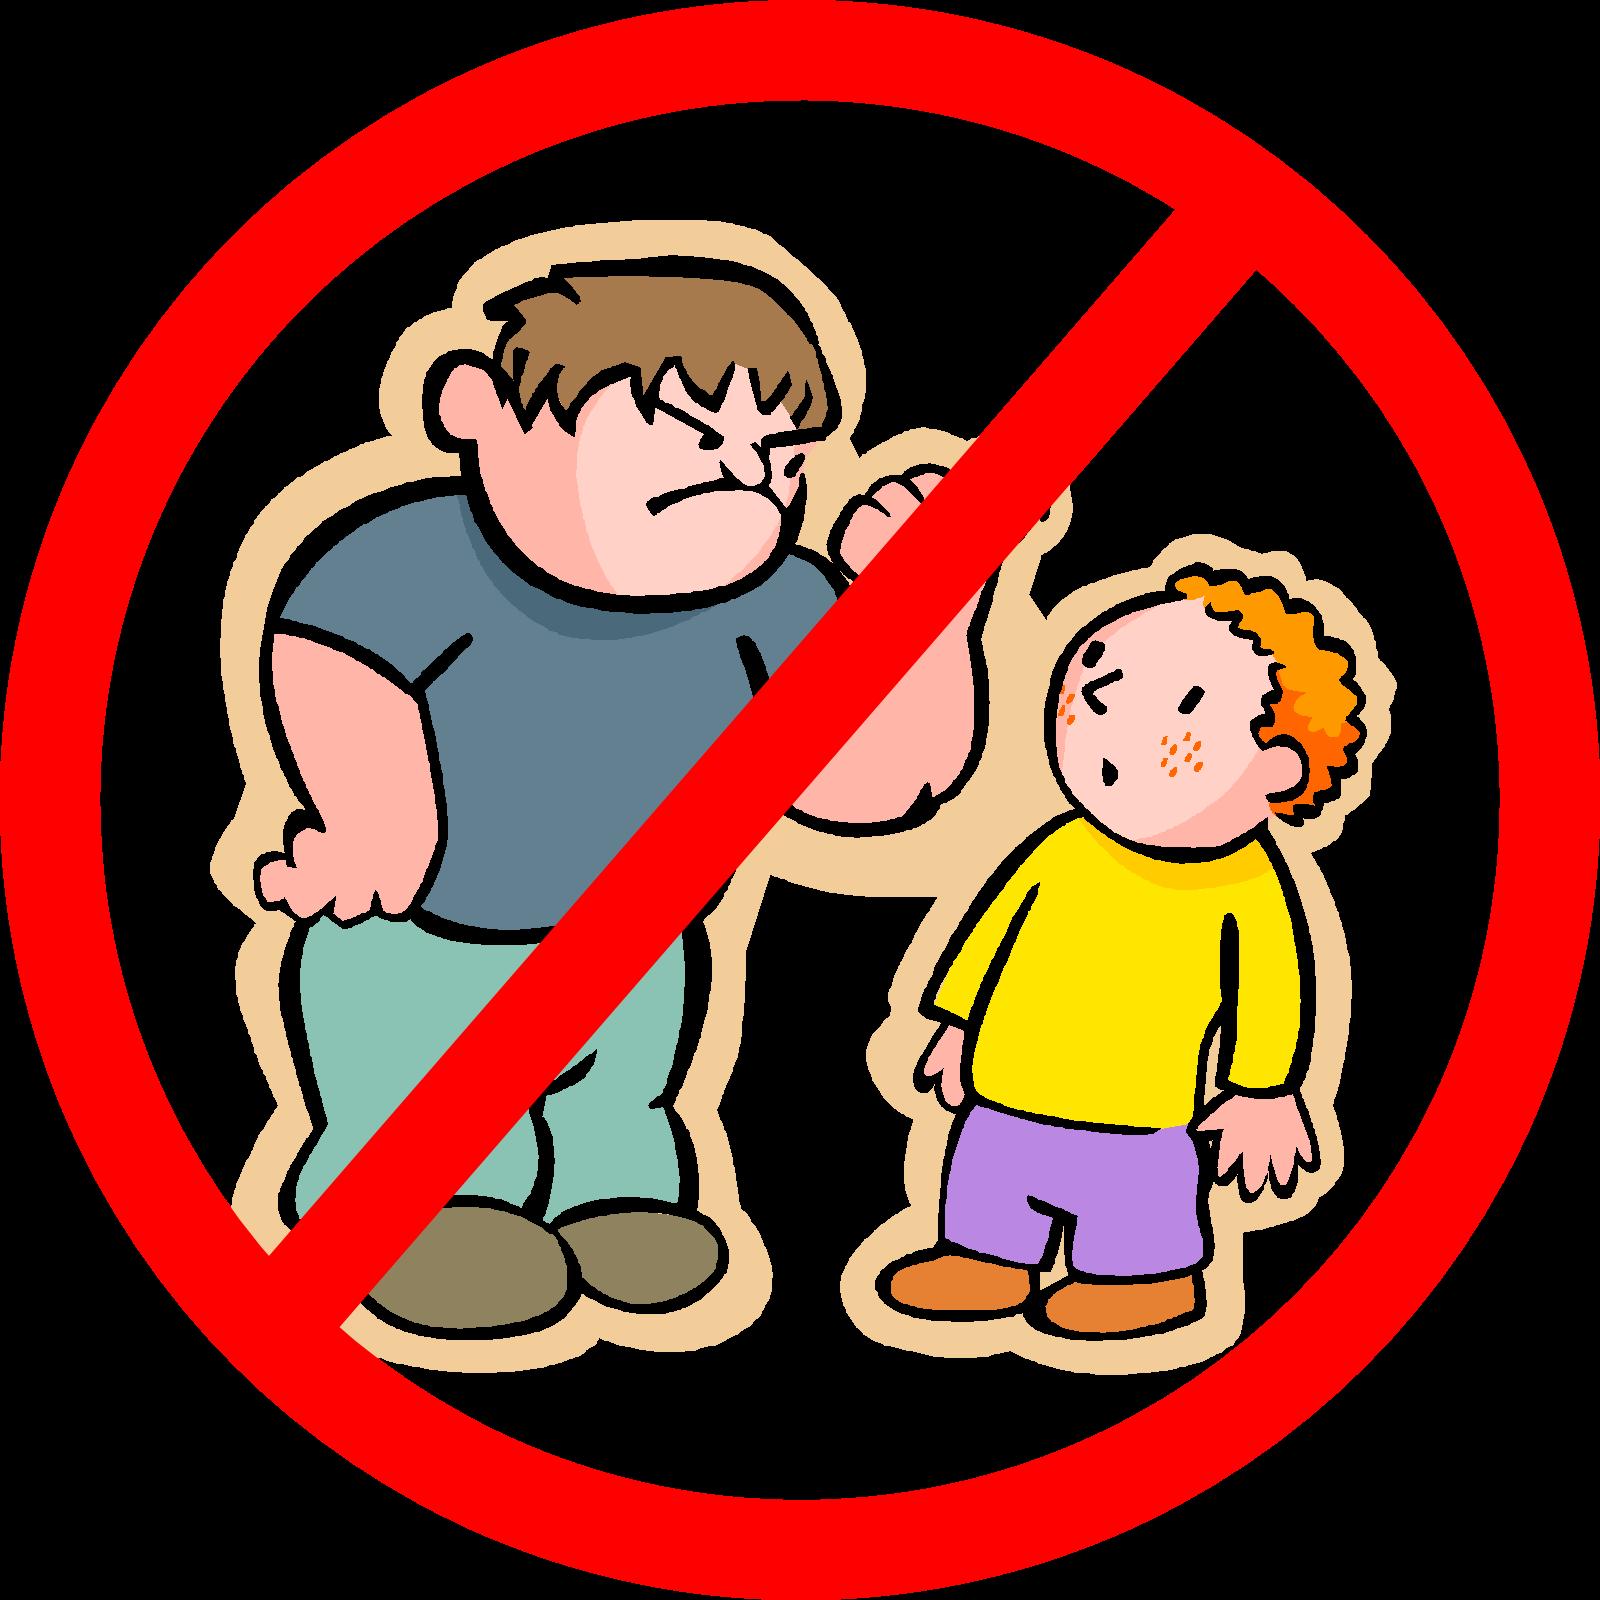 Anti Bullying Clip Art Clipart Best-Anti Bullying Clip Art Clipart Best-2